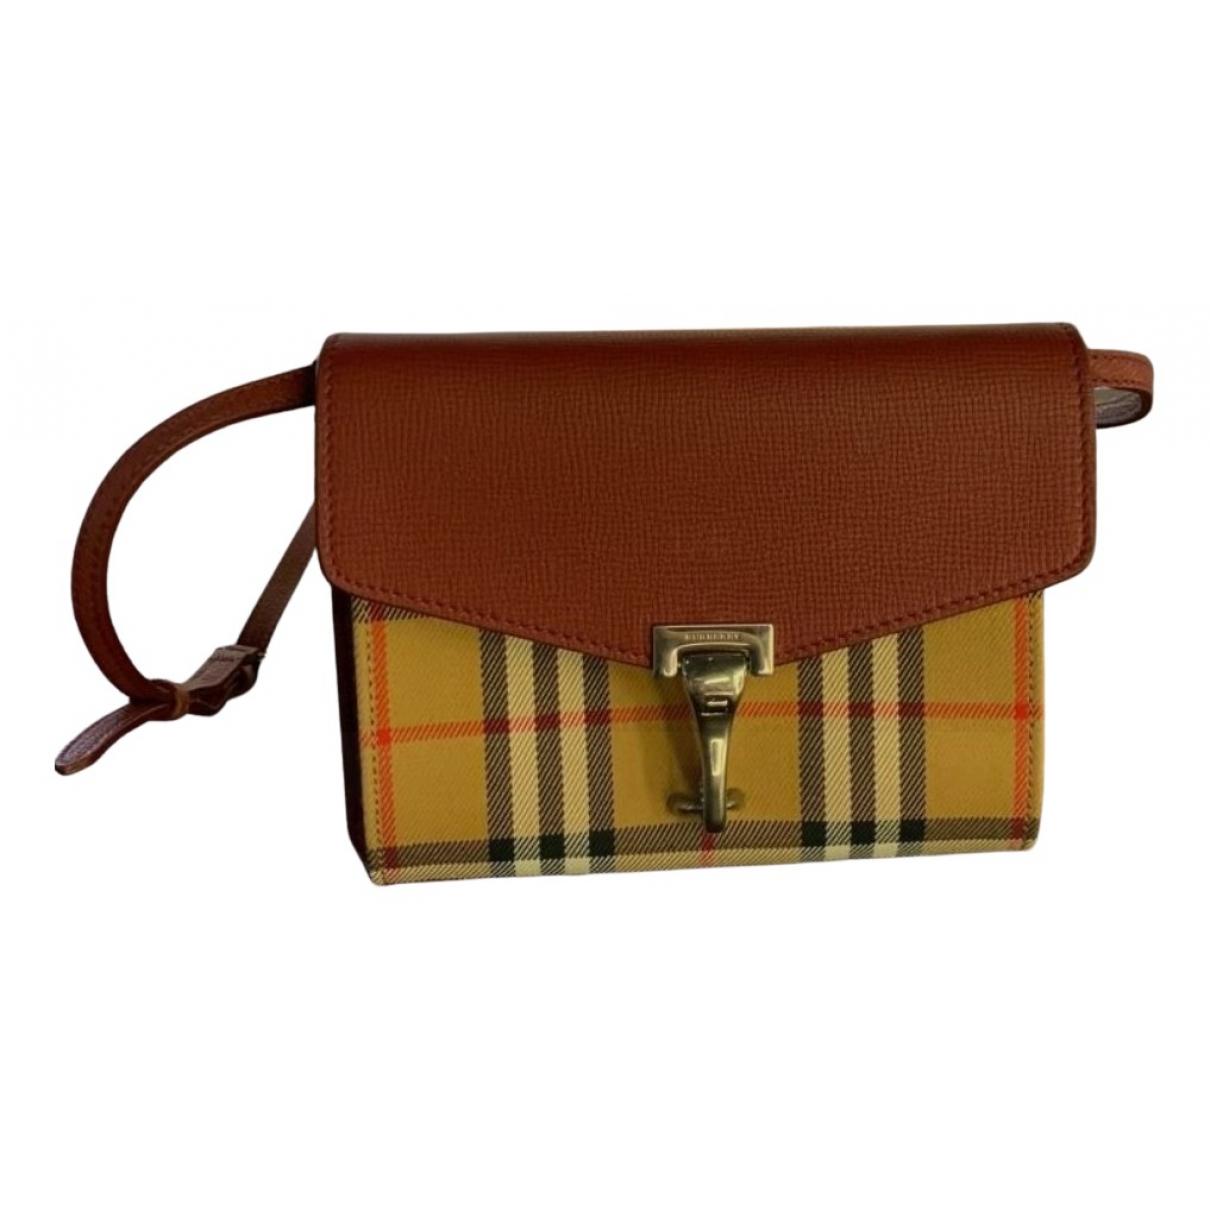 Burberry N Multicolour Leather handbag for Women N